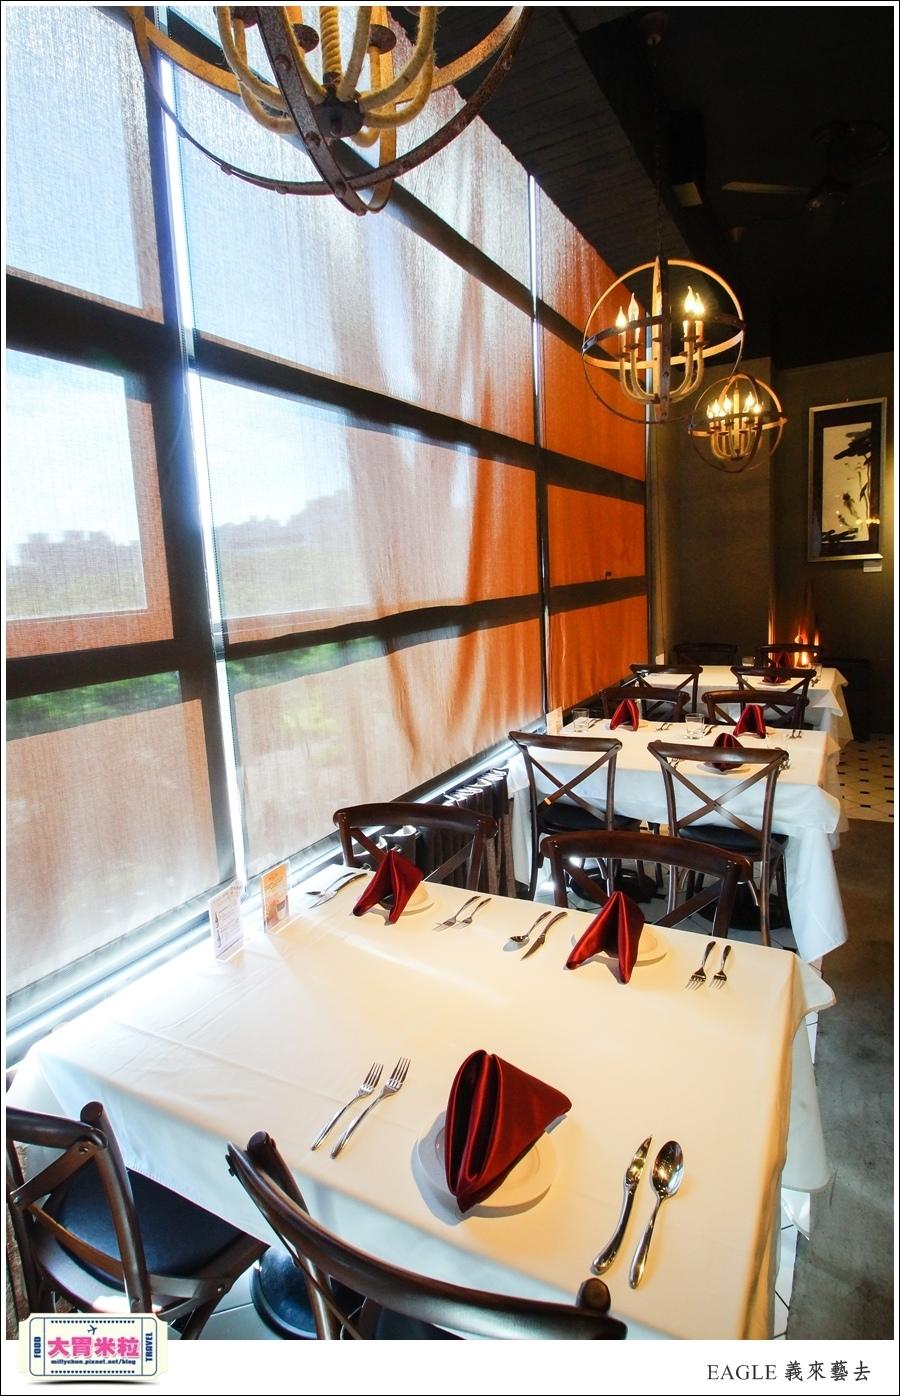 Hellmann's 康寶美玉白汁全台美味沙拉之旅xEAGLE 義來藝去義法餐廳@高雄義法餐廳推薦@大胃米粒0019.jpg